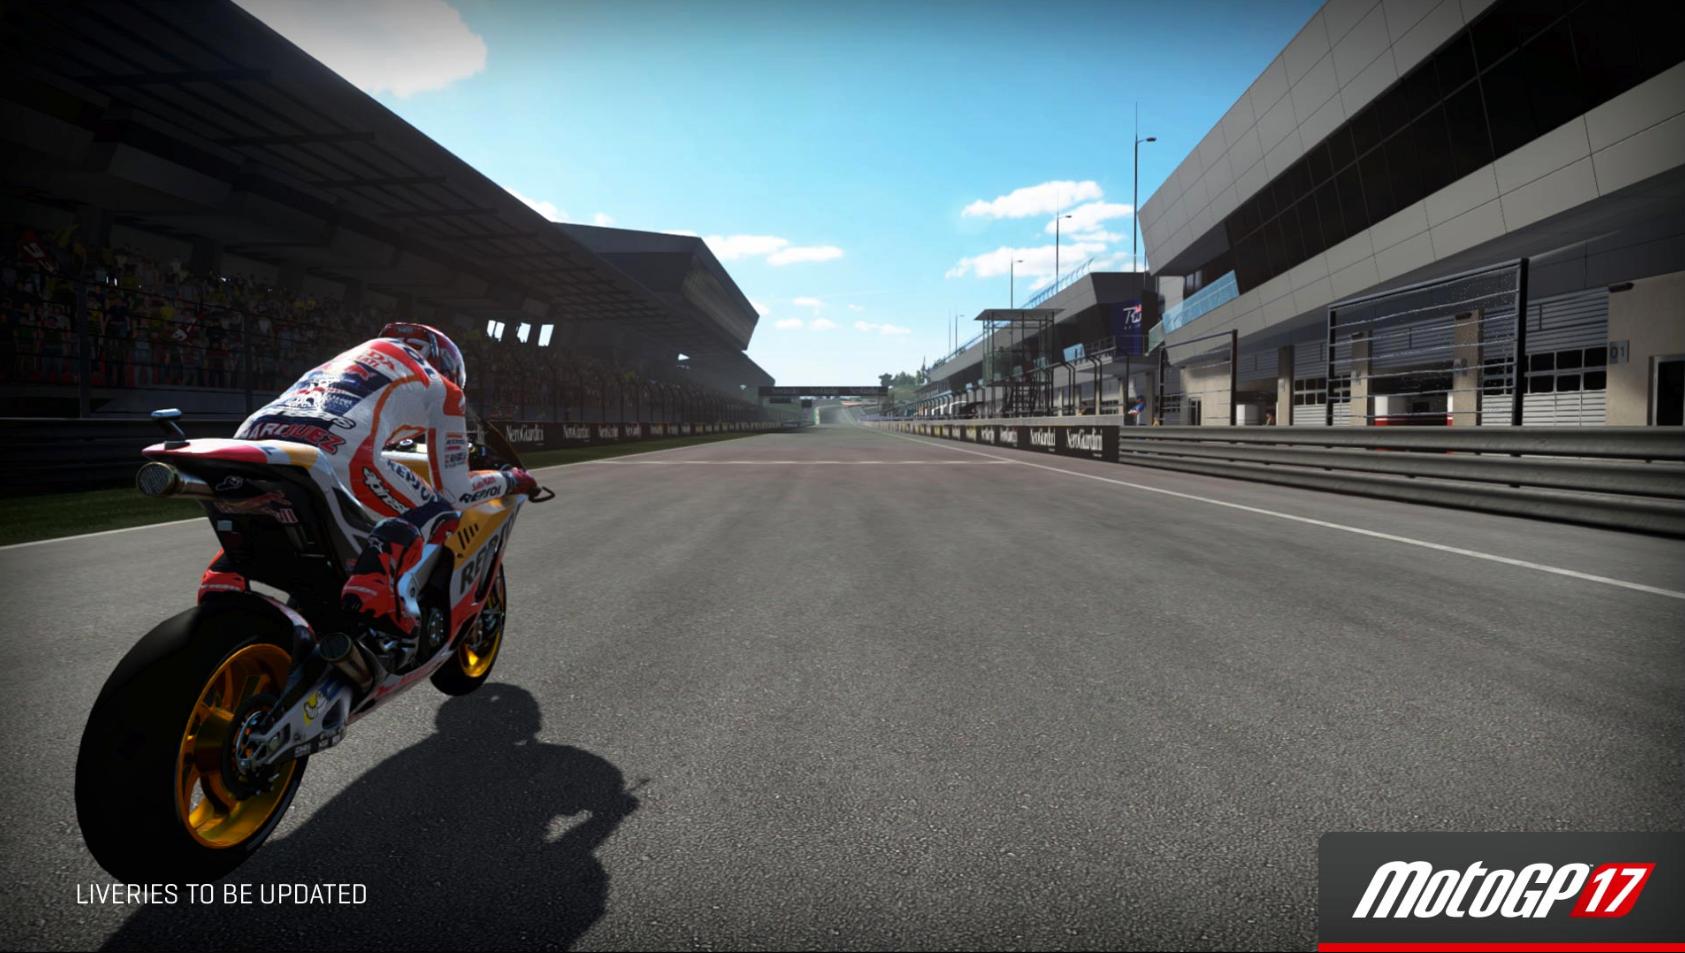 MotoGP 17 Red Bull Ring main straight